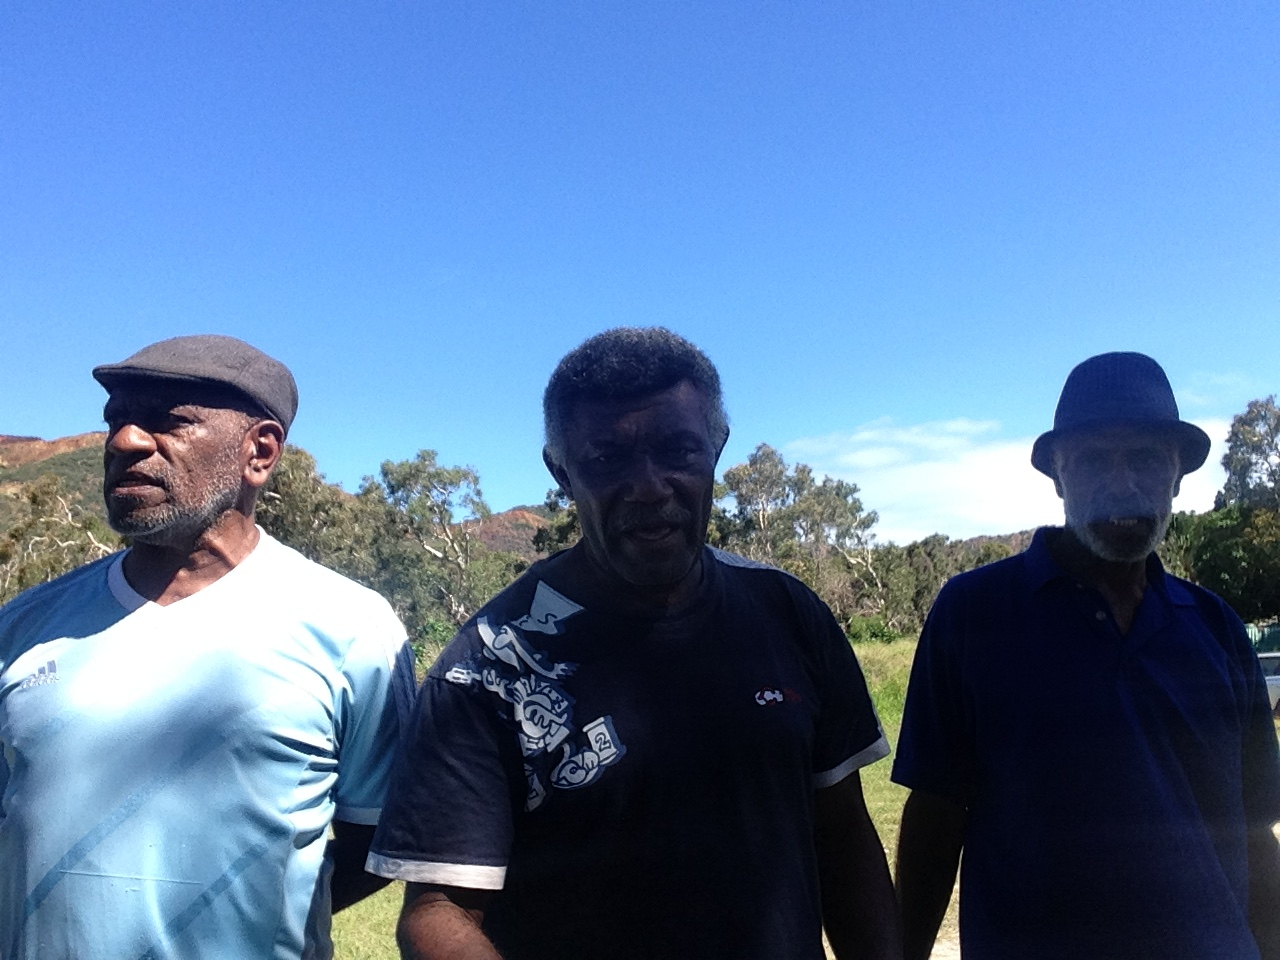 Les diacres : EURIMINDIA Ezeckias, CAMOUI Jojo, et POROU Dogan responsables des diacres de Momawe